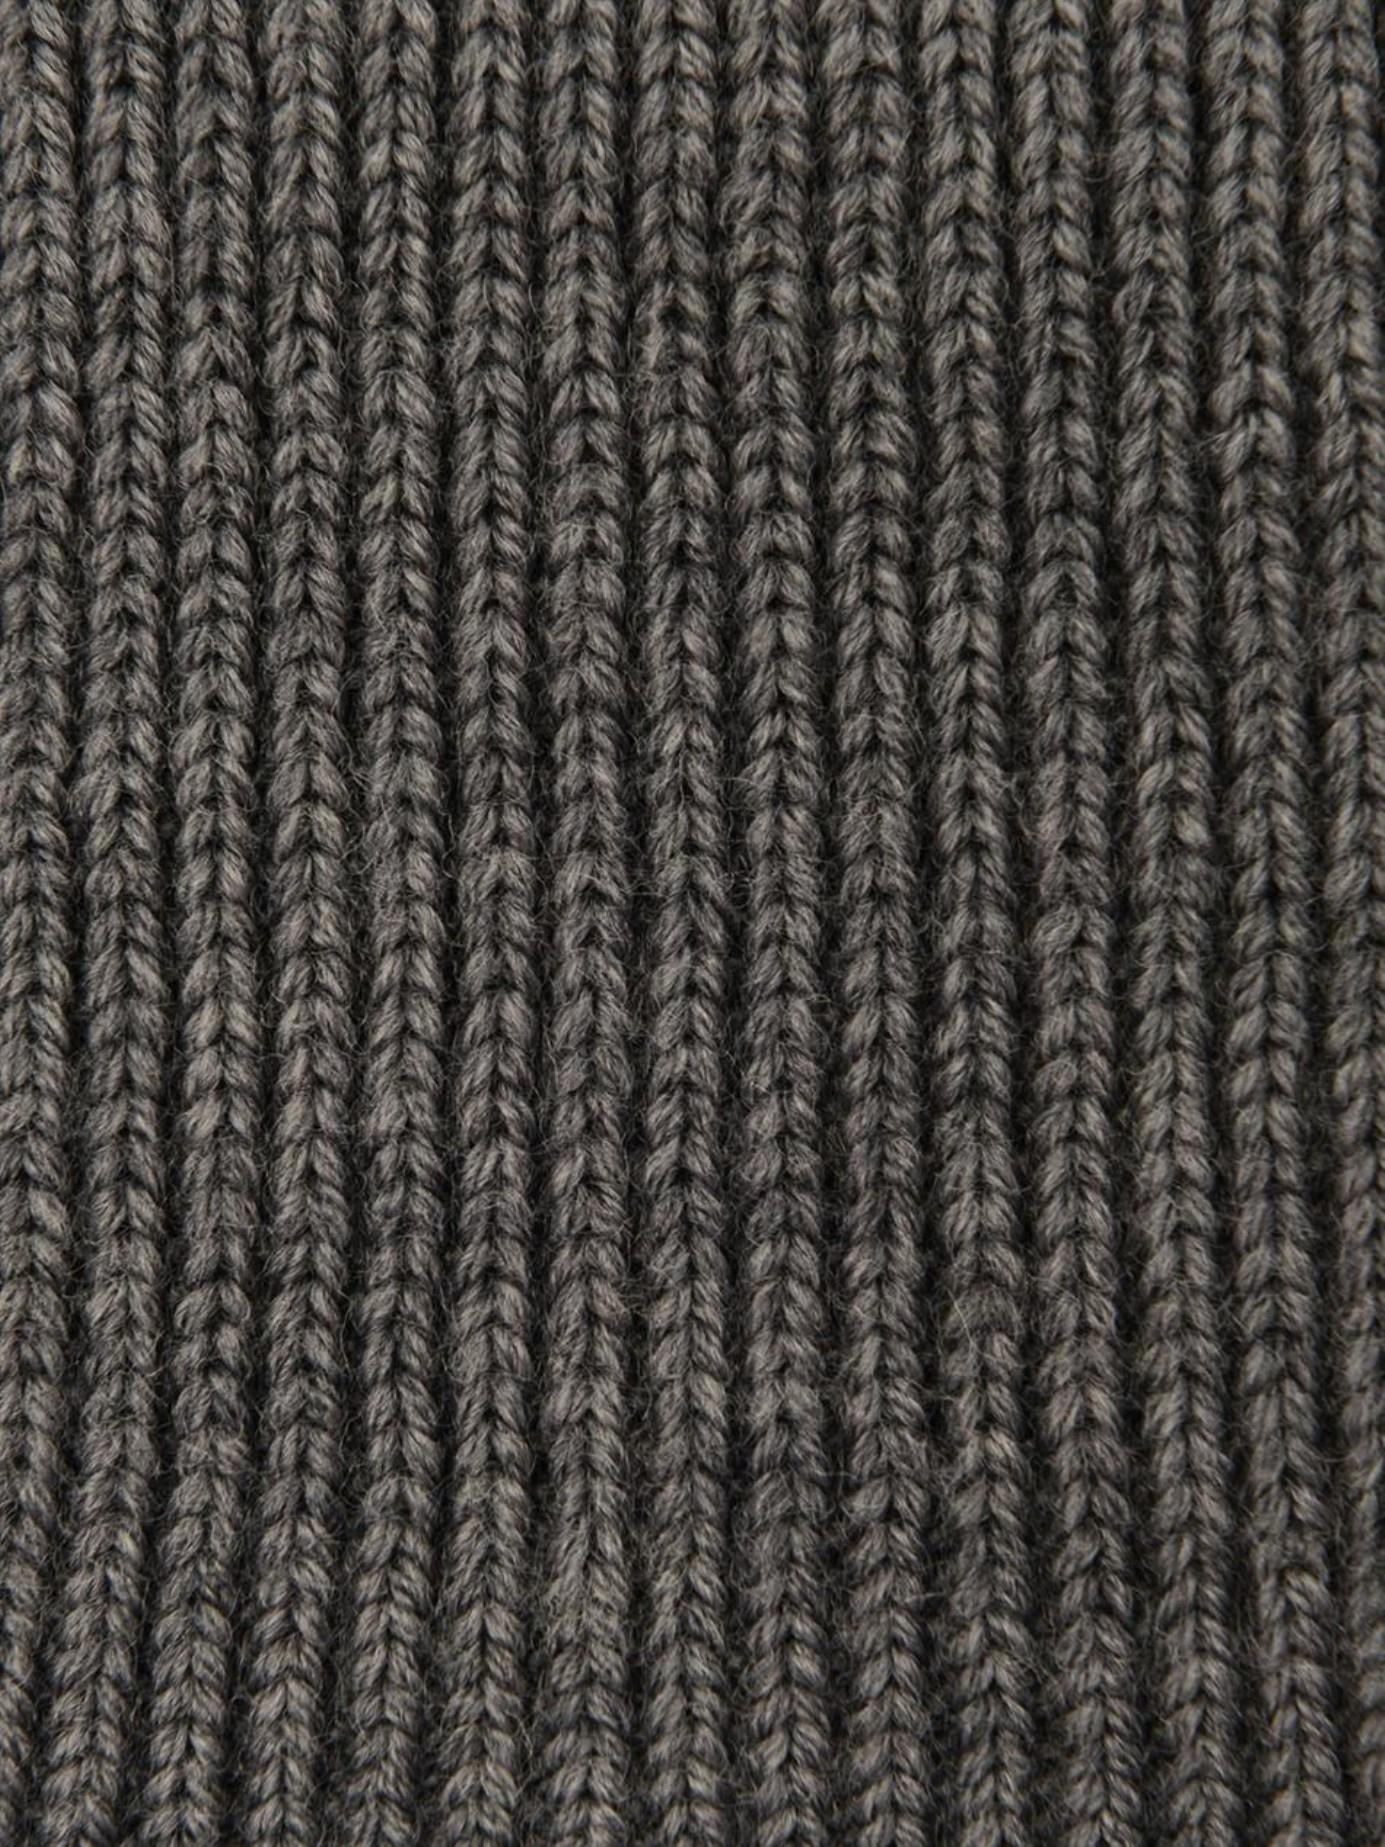 4f5a9bfa5 Stella McCartney Long Ribbed-Knit Wool Gloves in Gray - Lyst